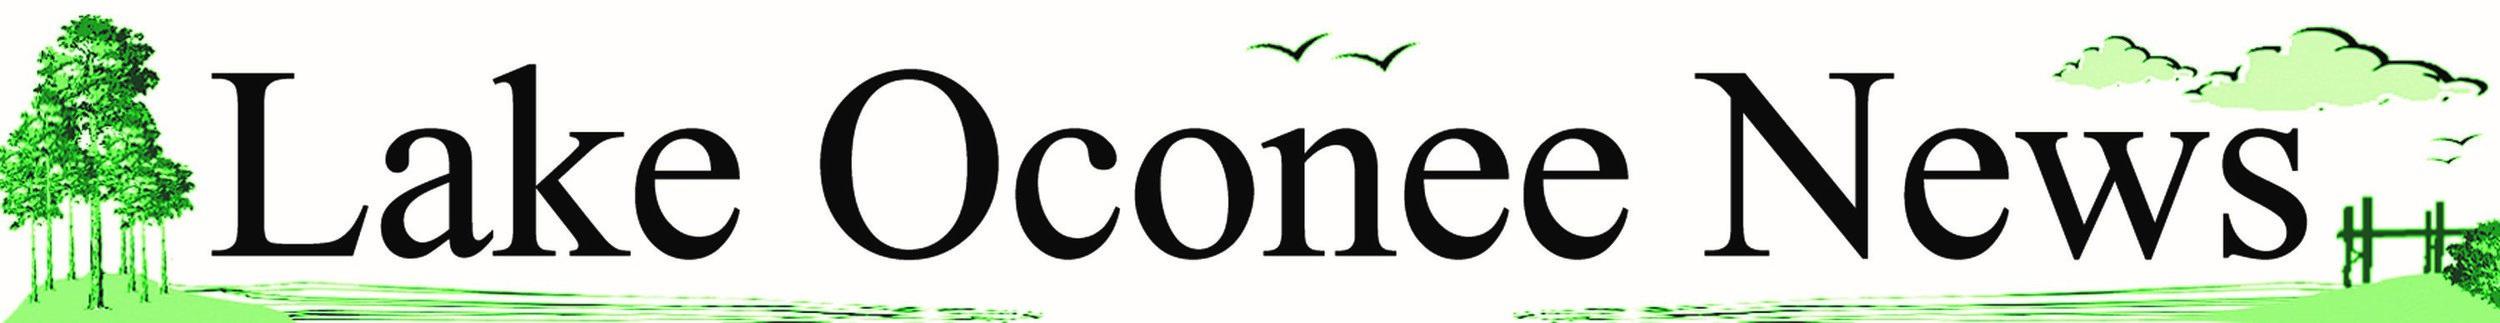 Lake Oconee News 2.jpg